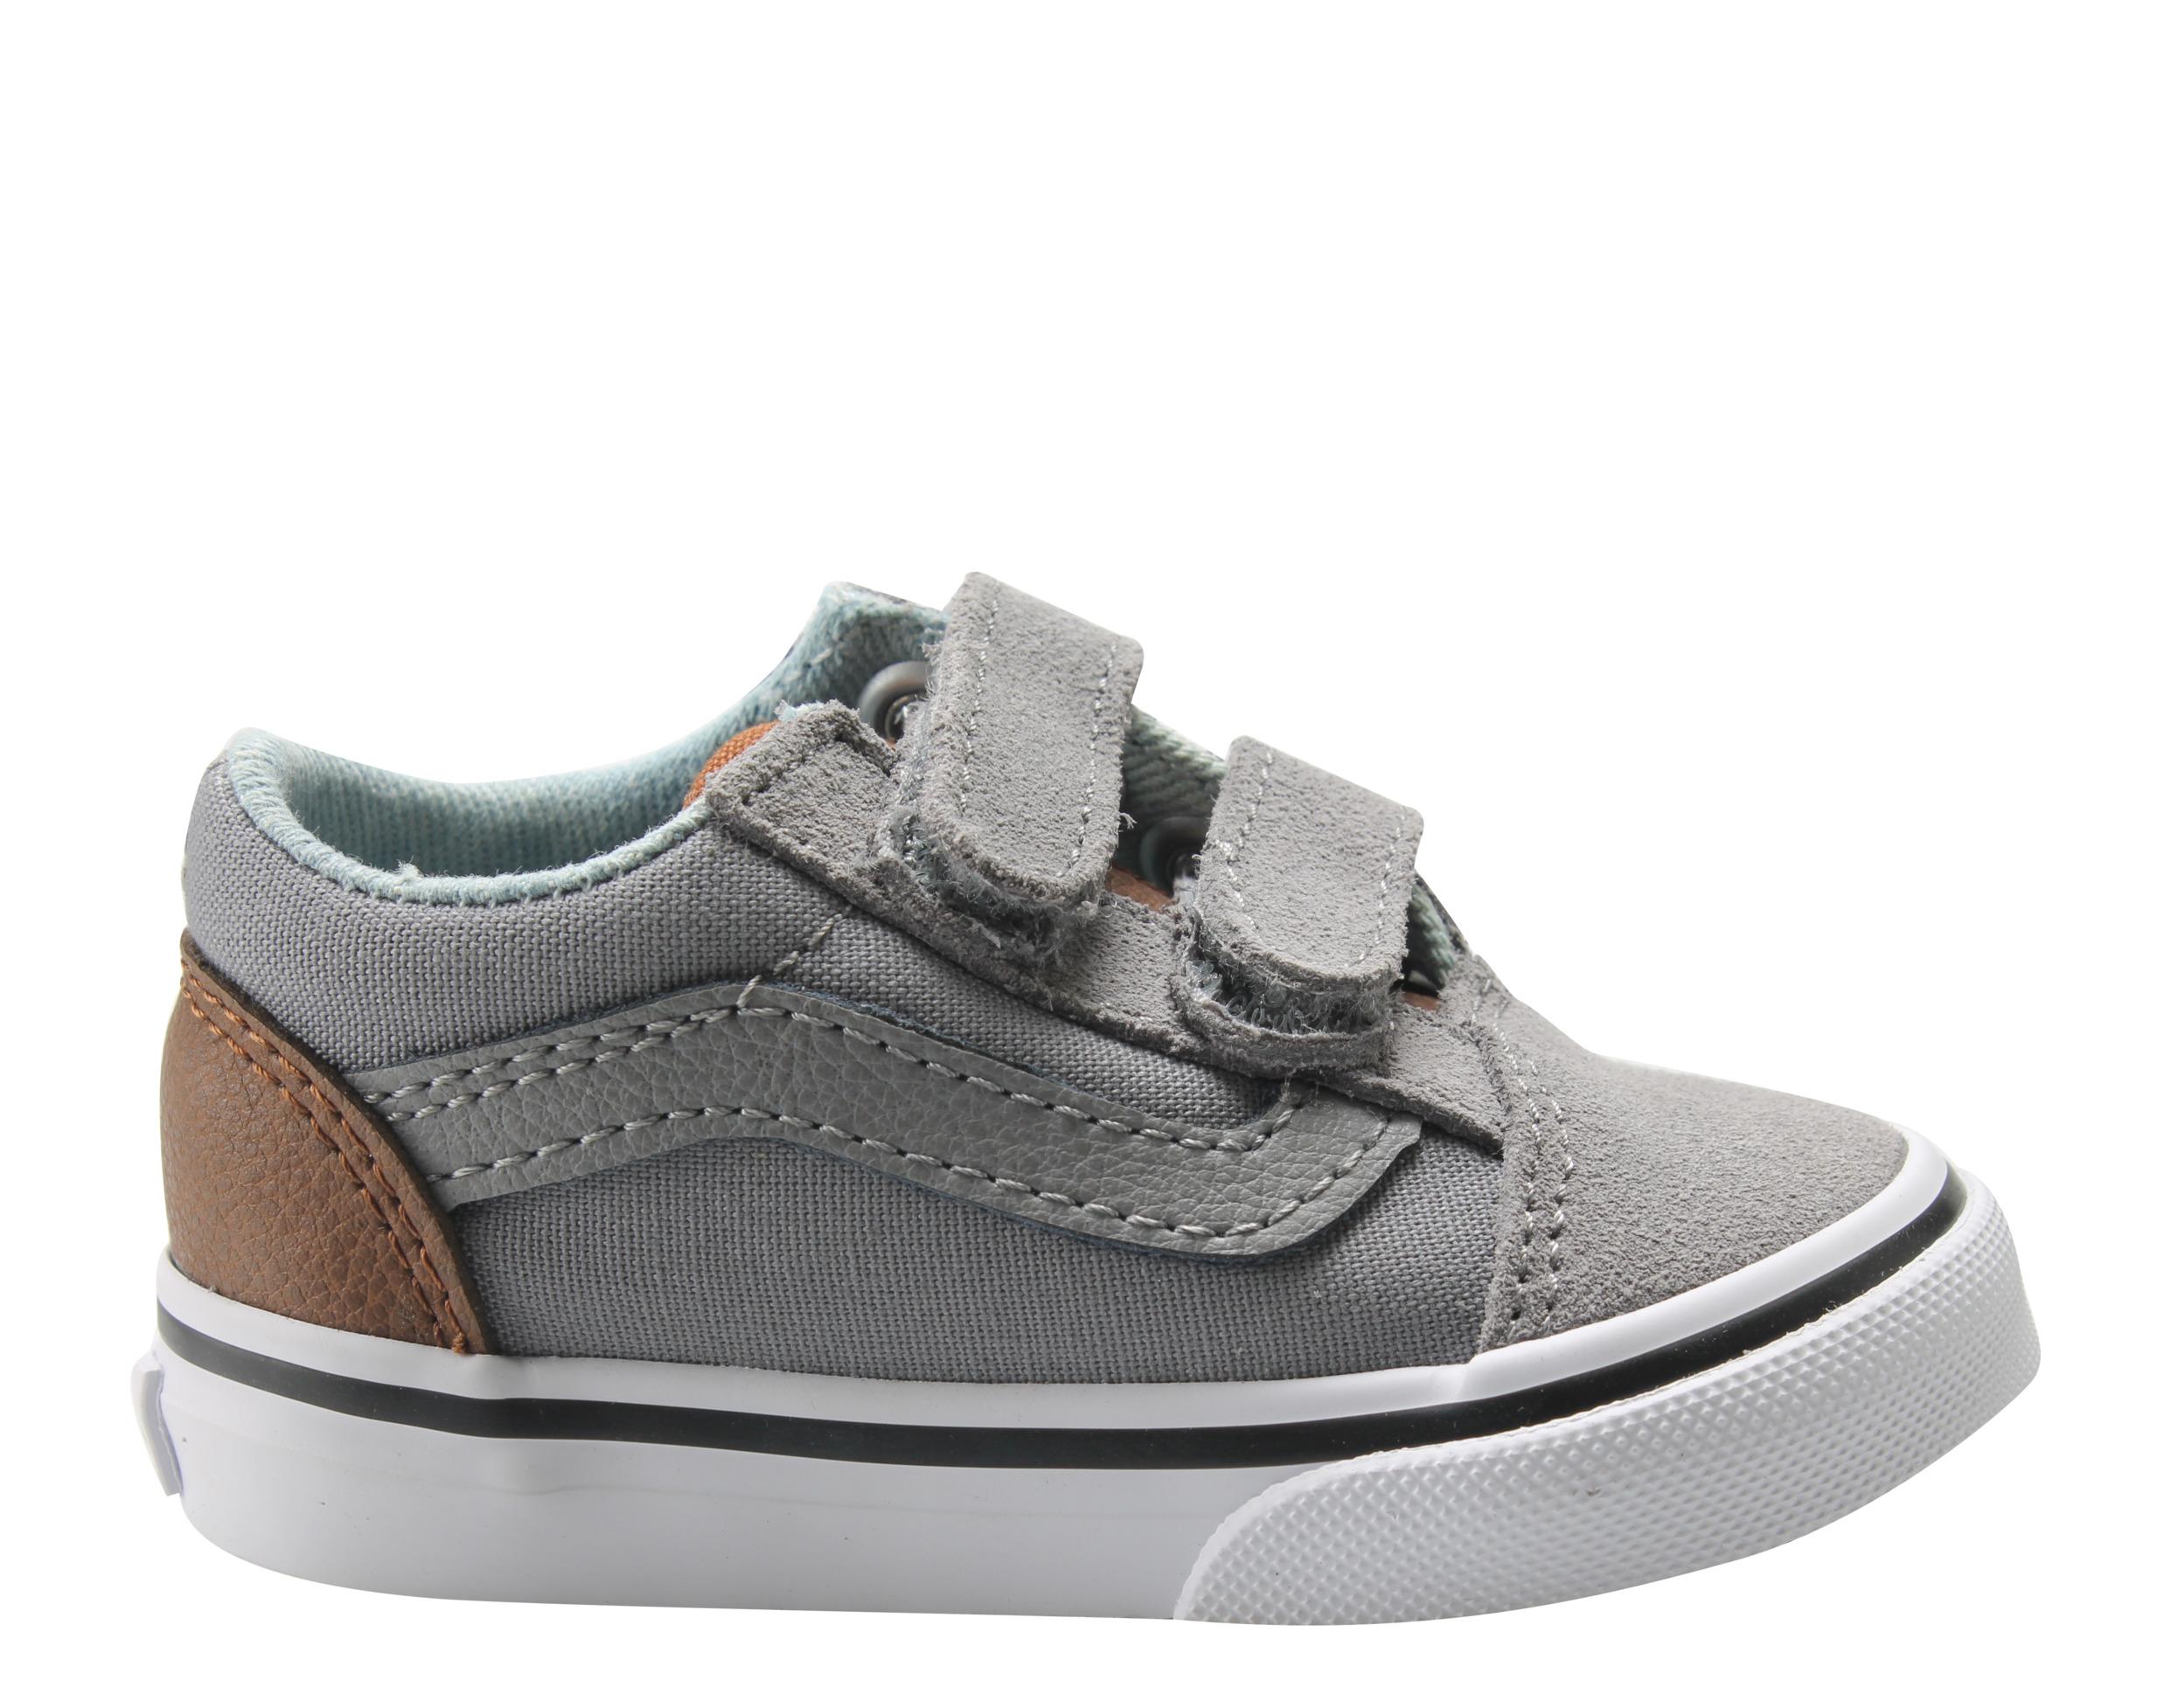 1ec5fb7a0a Vans - Vans Old Skool V Frost Gray Acid Denim Low Toddler Kids Sneakers  VN0A344KQ70 - Walmart.com